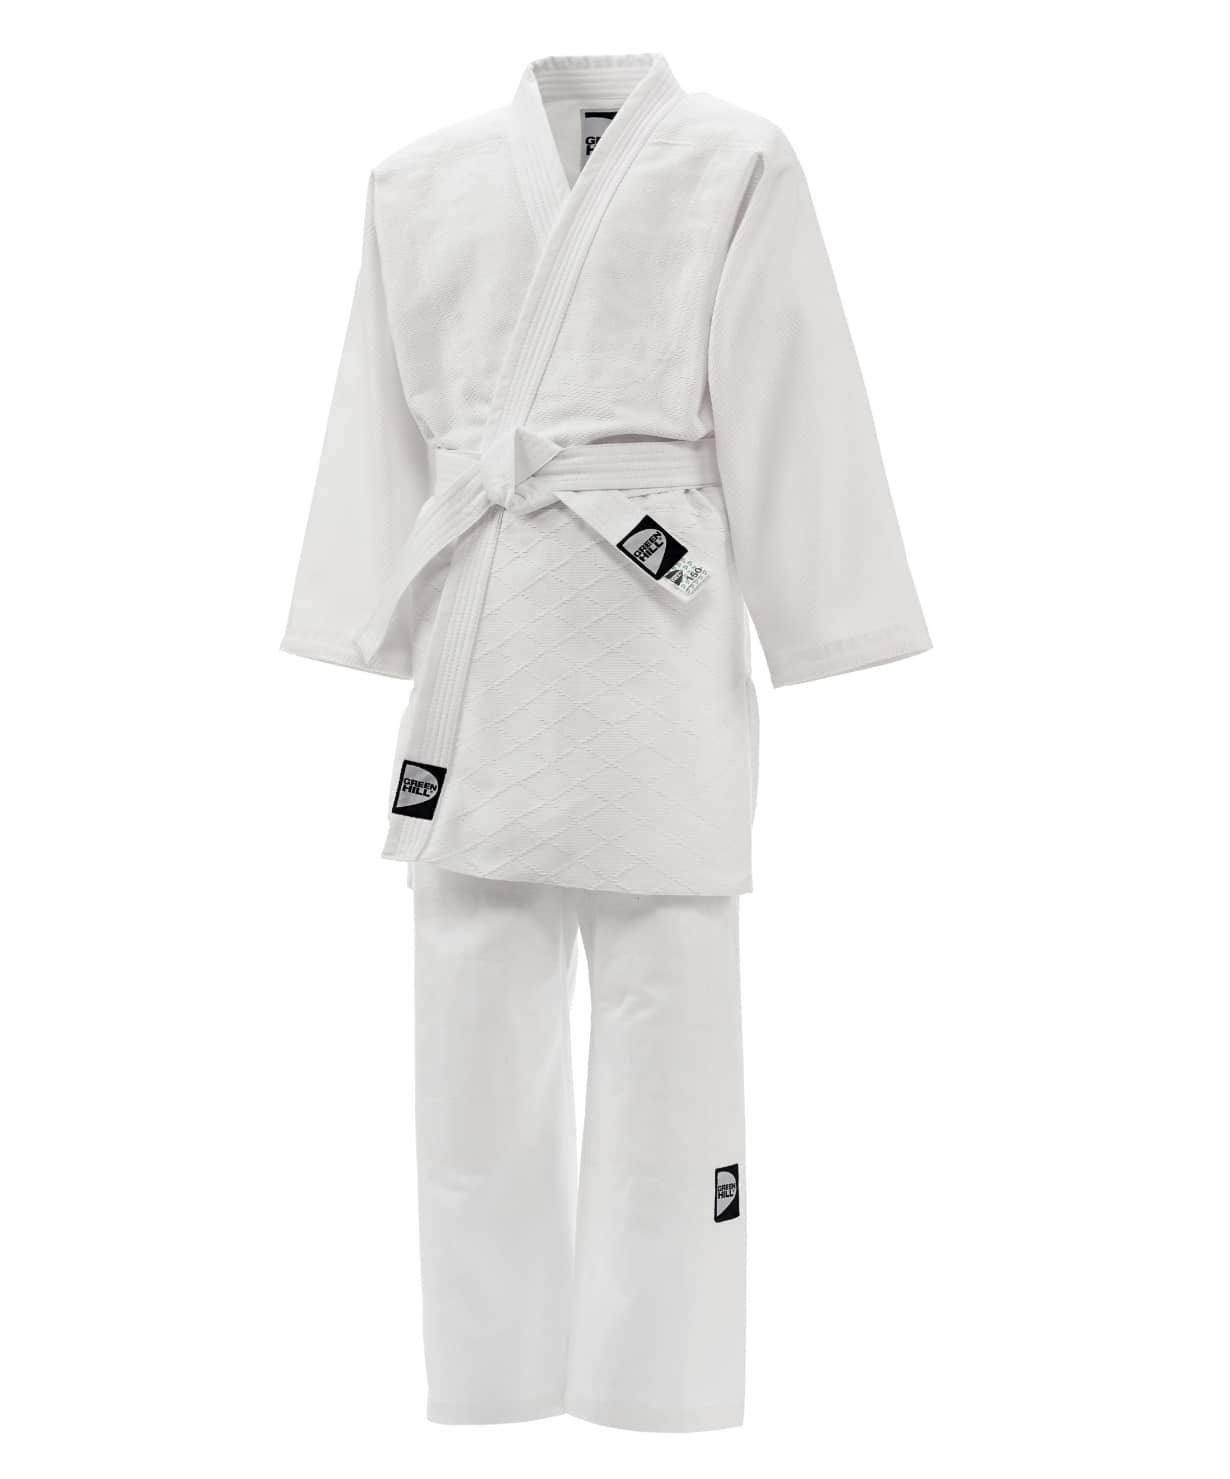 Кимоно для дзюдо JSST-10572, белый, р.000/110